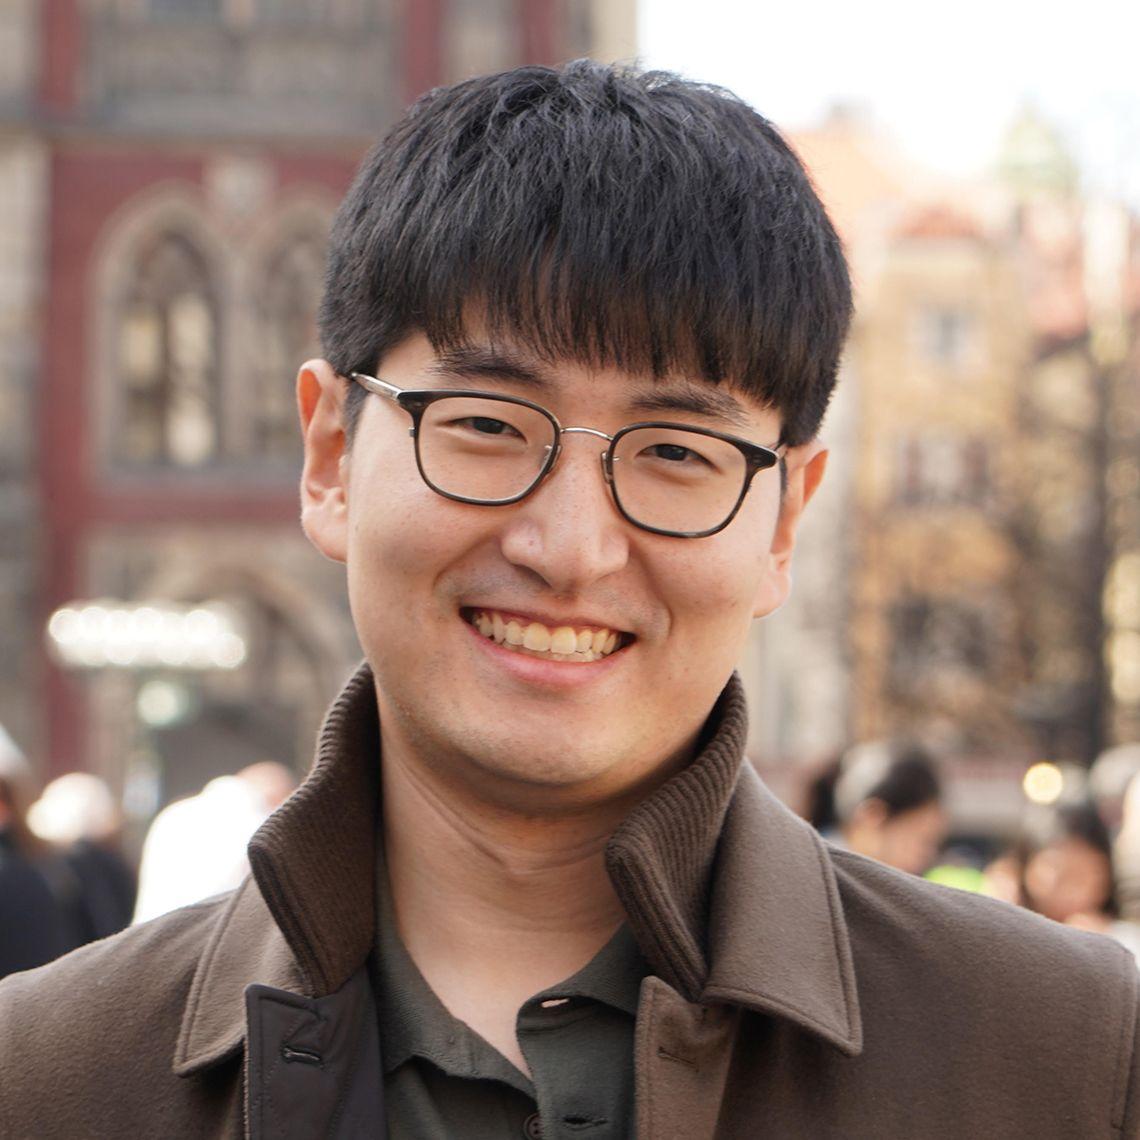 Jaeho Chang